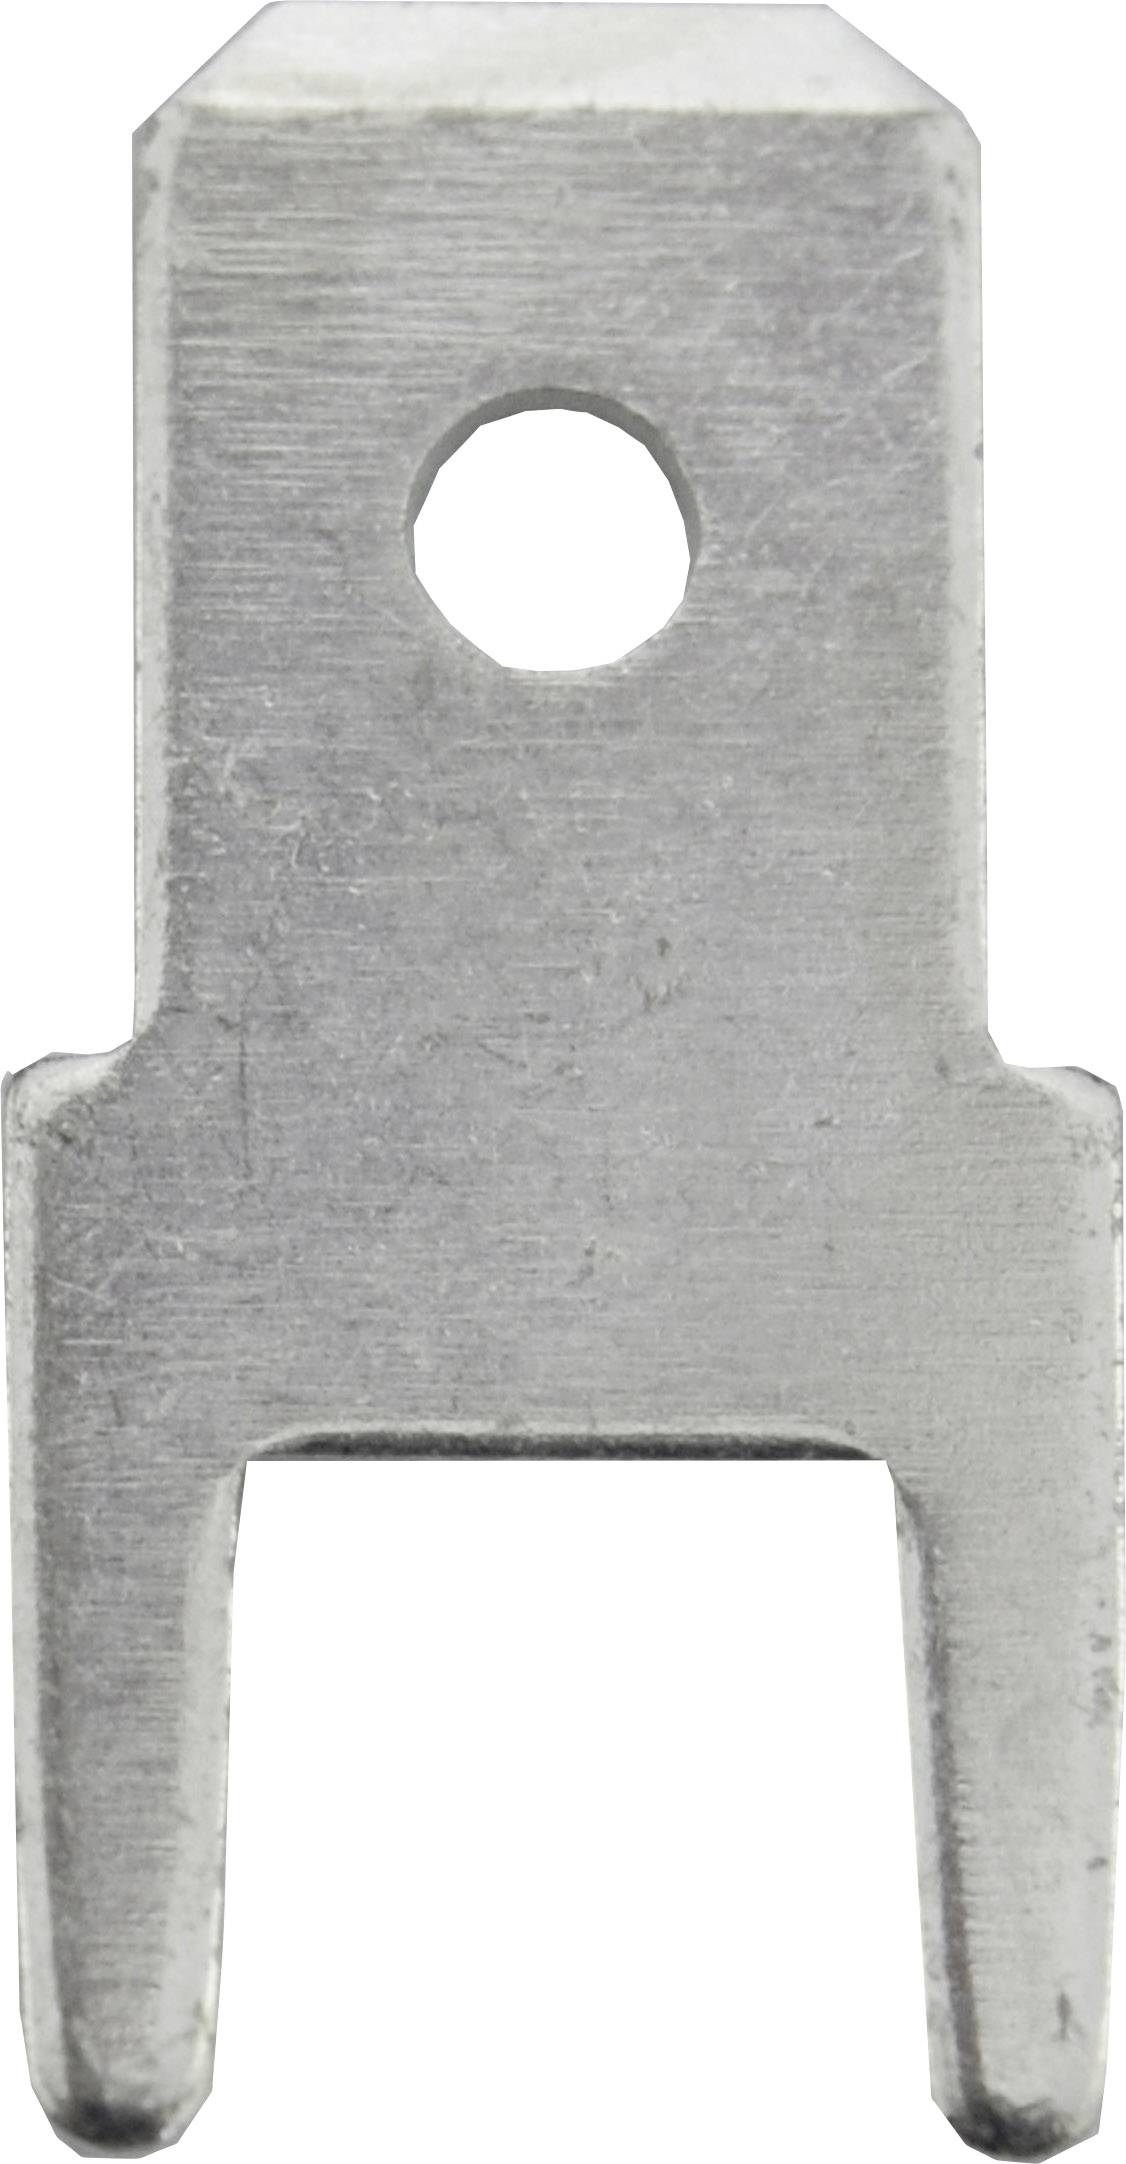 Faston zástrčka Vogt Verbindungstechnik 3825l05.68 4.8 mm x 0.5 mm, 180 °, bez izolace, kov, 100 ks